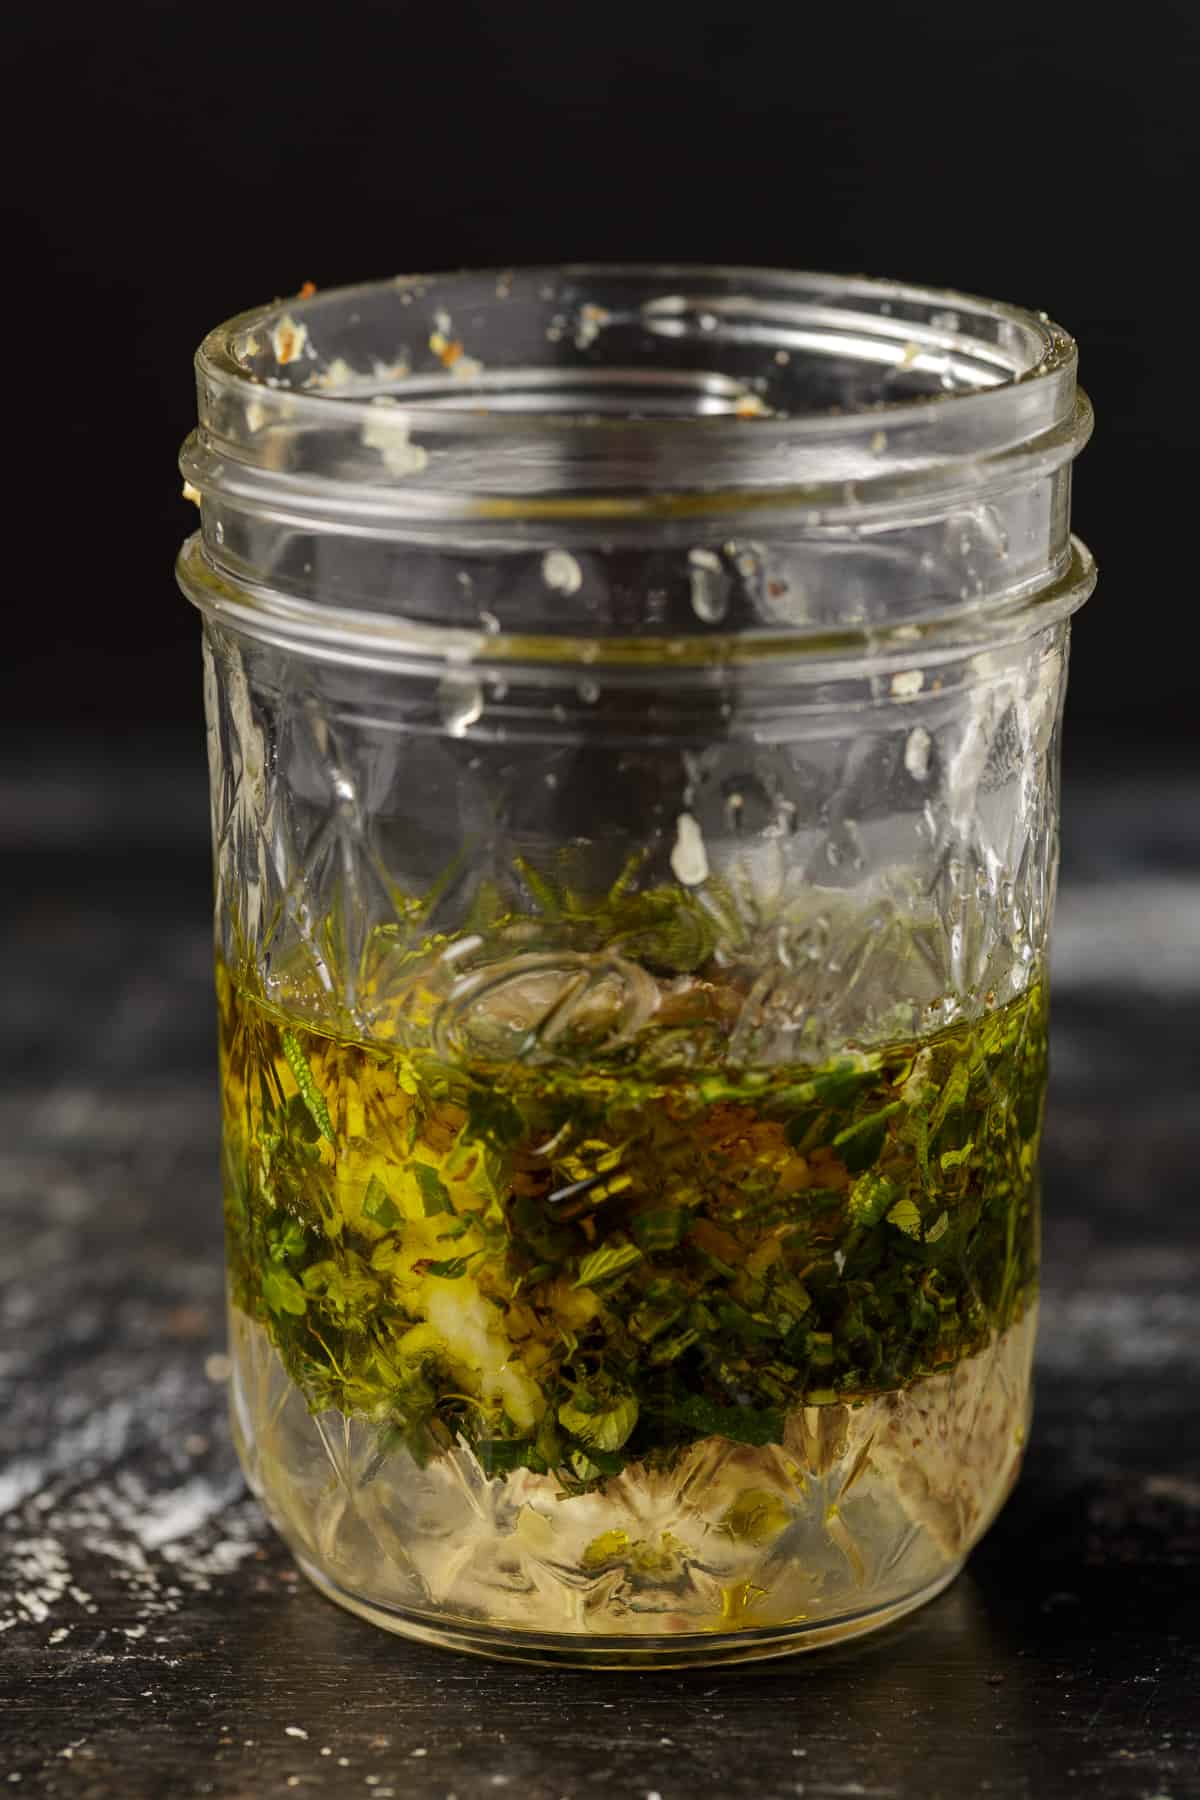 A jar of salad dressing